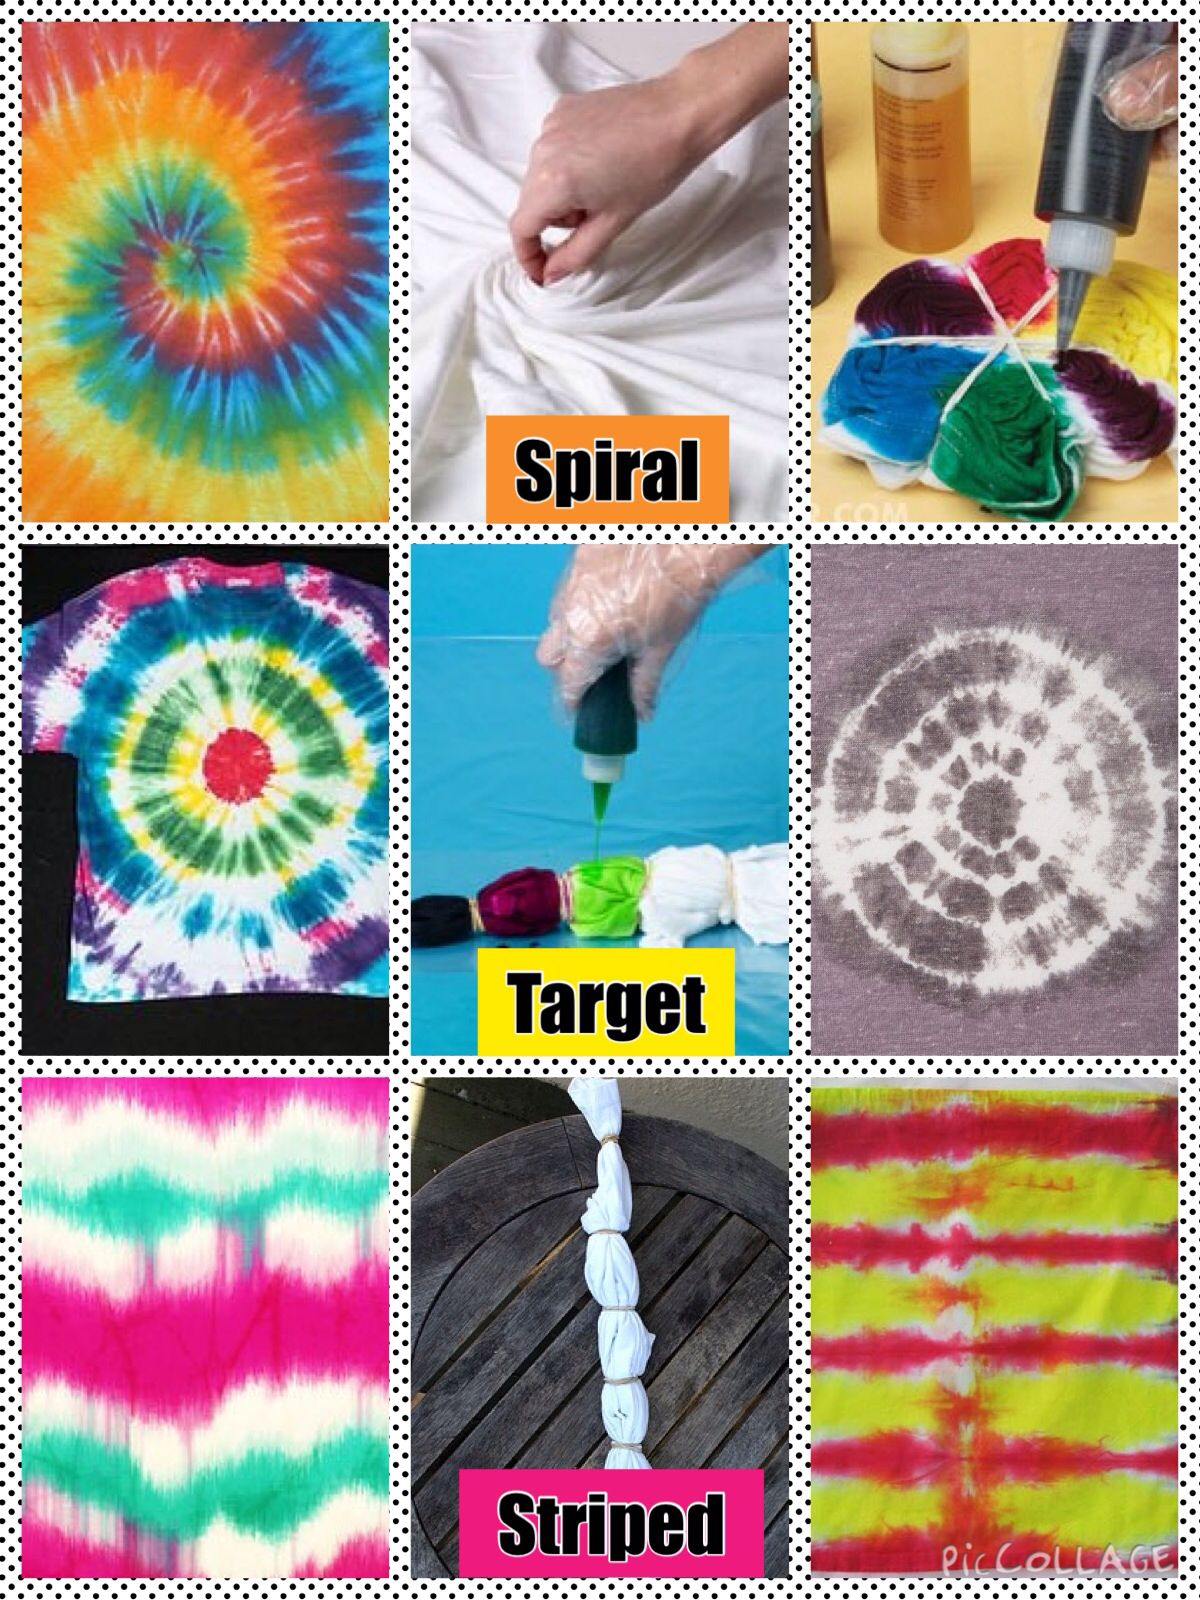 tie dye techniques for the kids tie dye techniques tie dye crafts tie dye. Black Bedroom Furniture Sets. Home Design Ideas